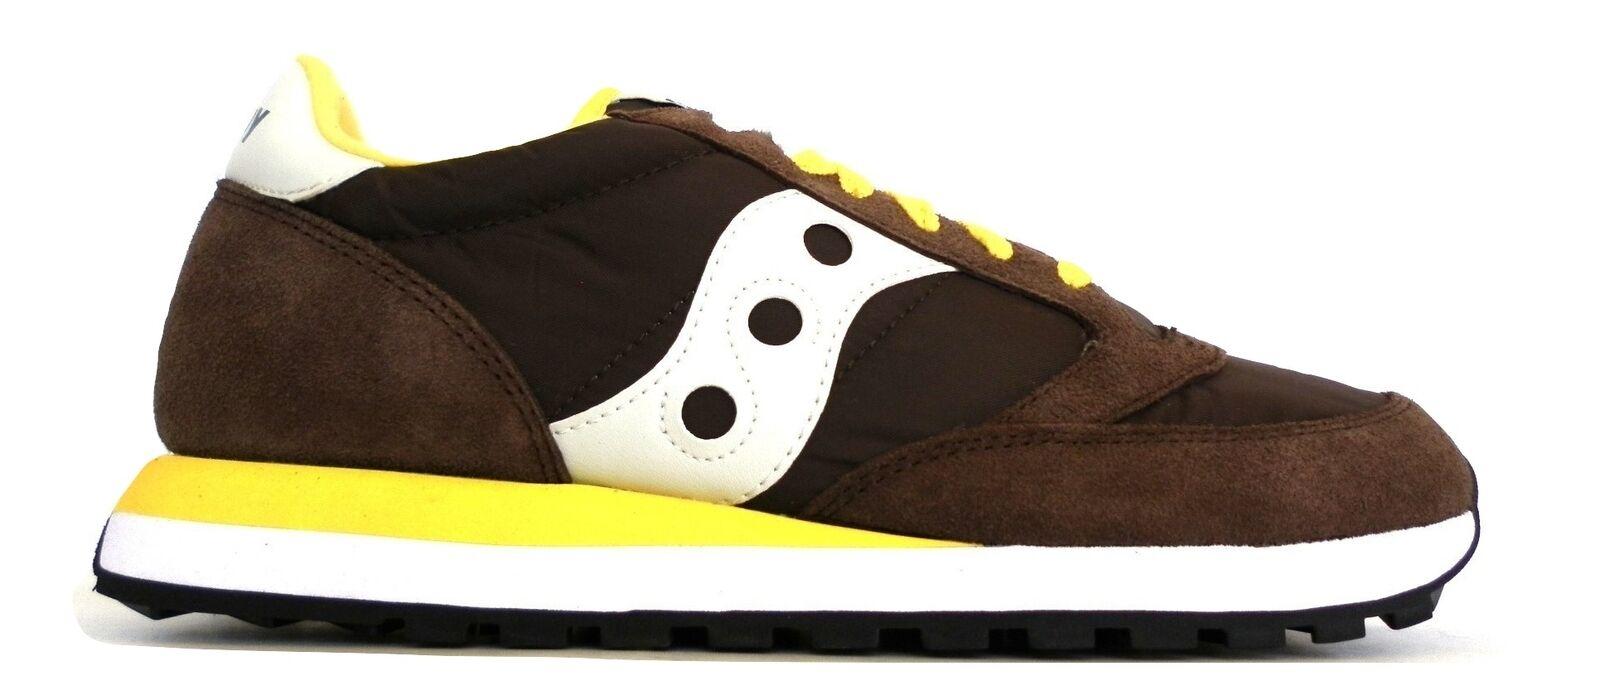 SAUCONY scarpe scarpe da ginnastica uomo JAZZ ORIGINAL S2044-416 Marroneeee e giallo